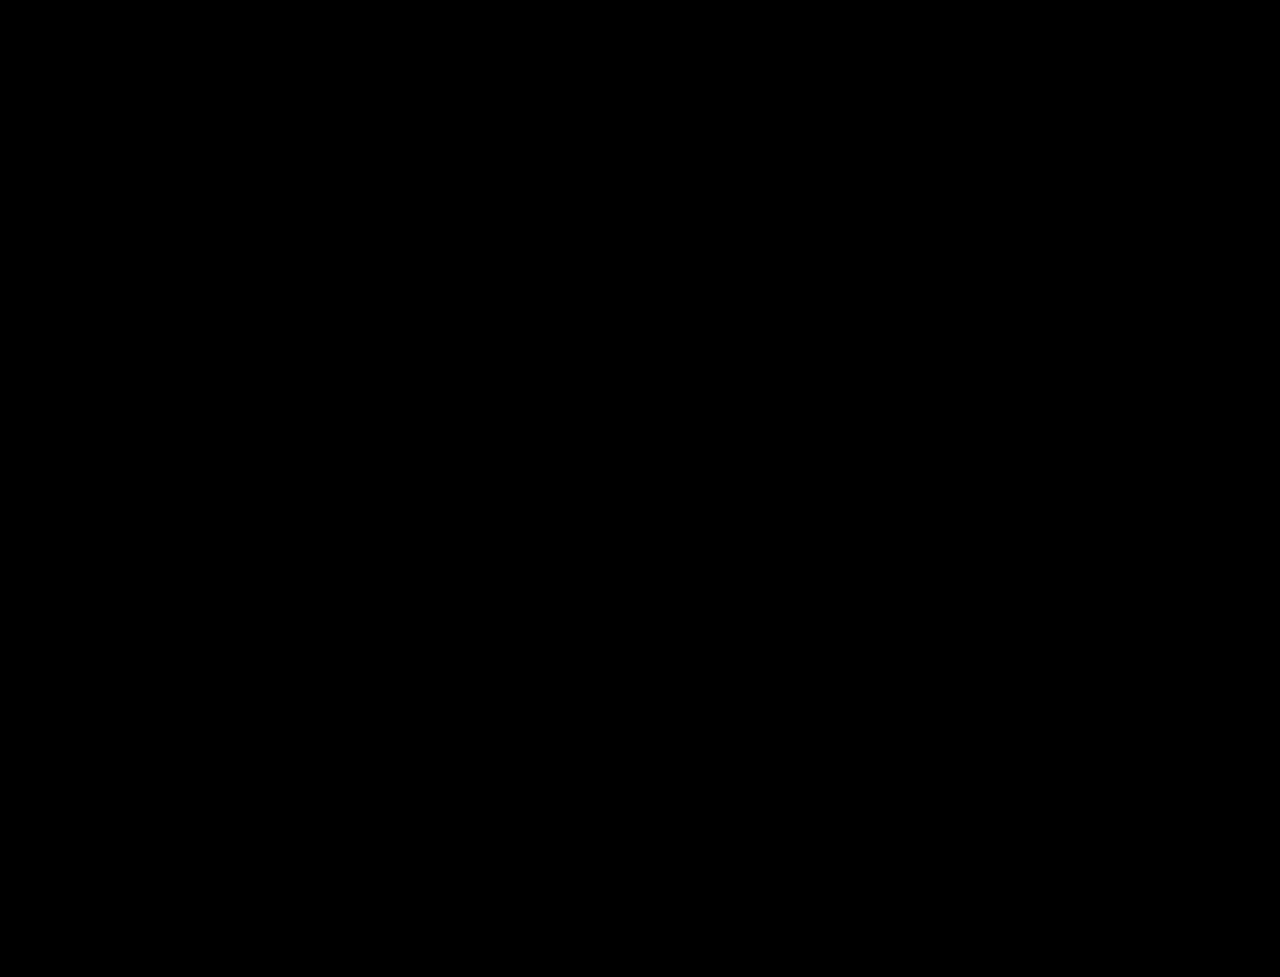 horoscoop per sterrenbeeld vanaf 23 november 2020